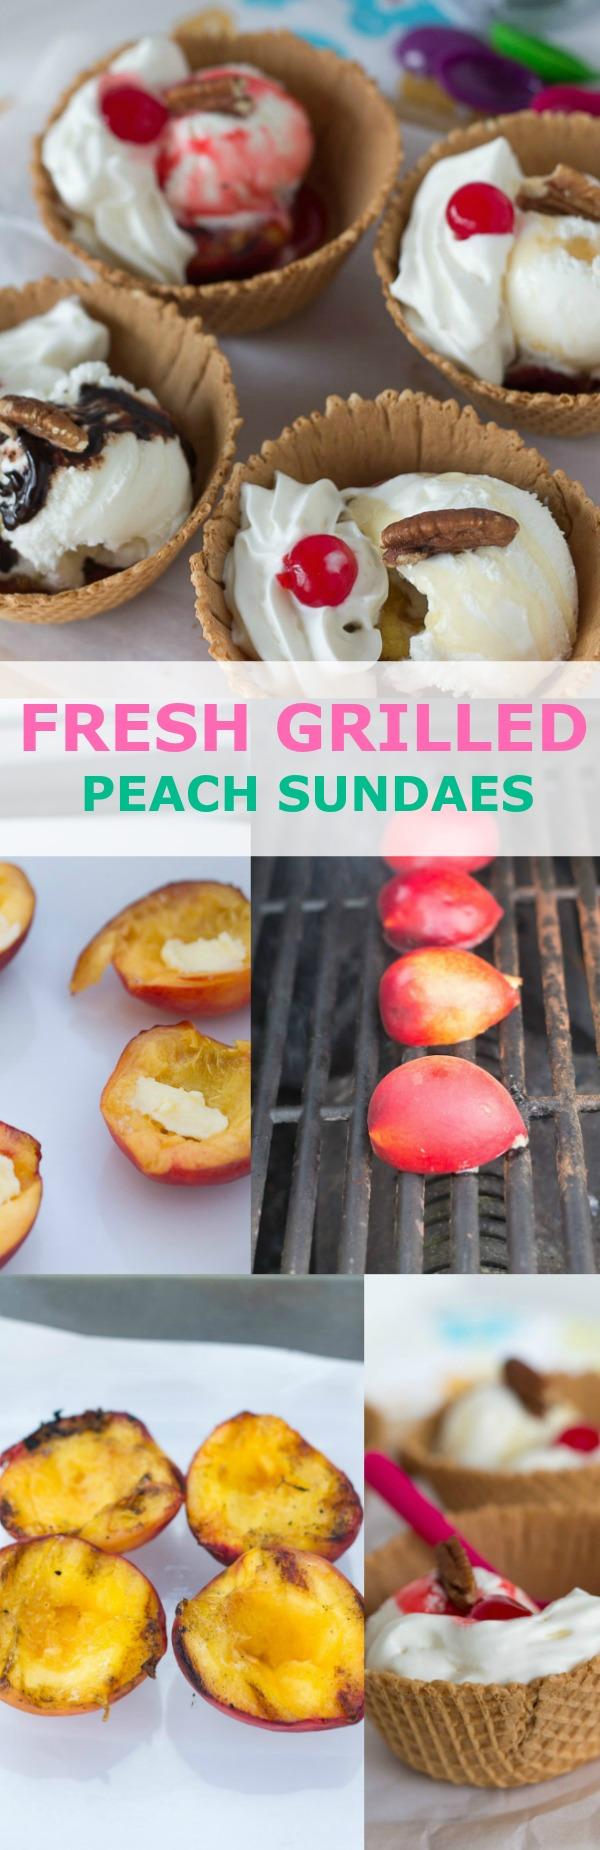 fresh grilled peach sundaes